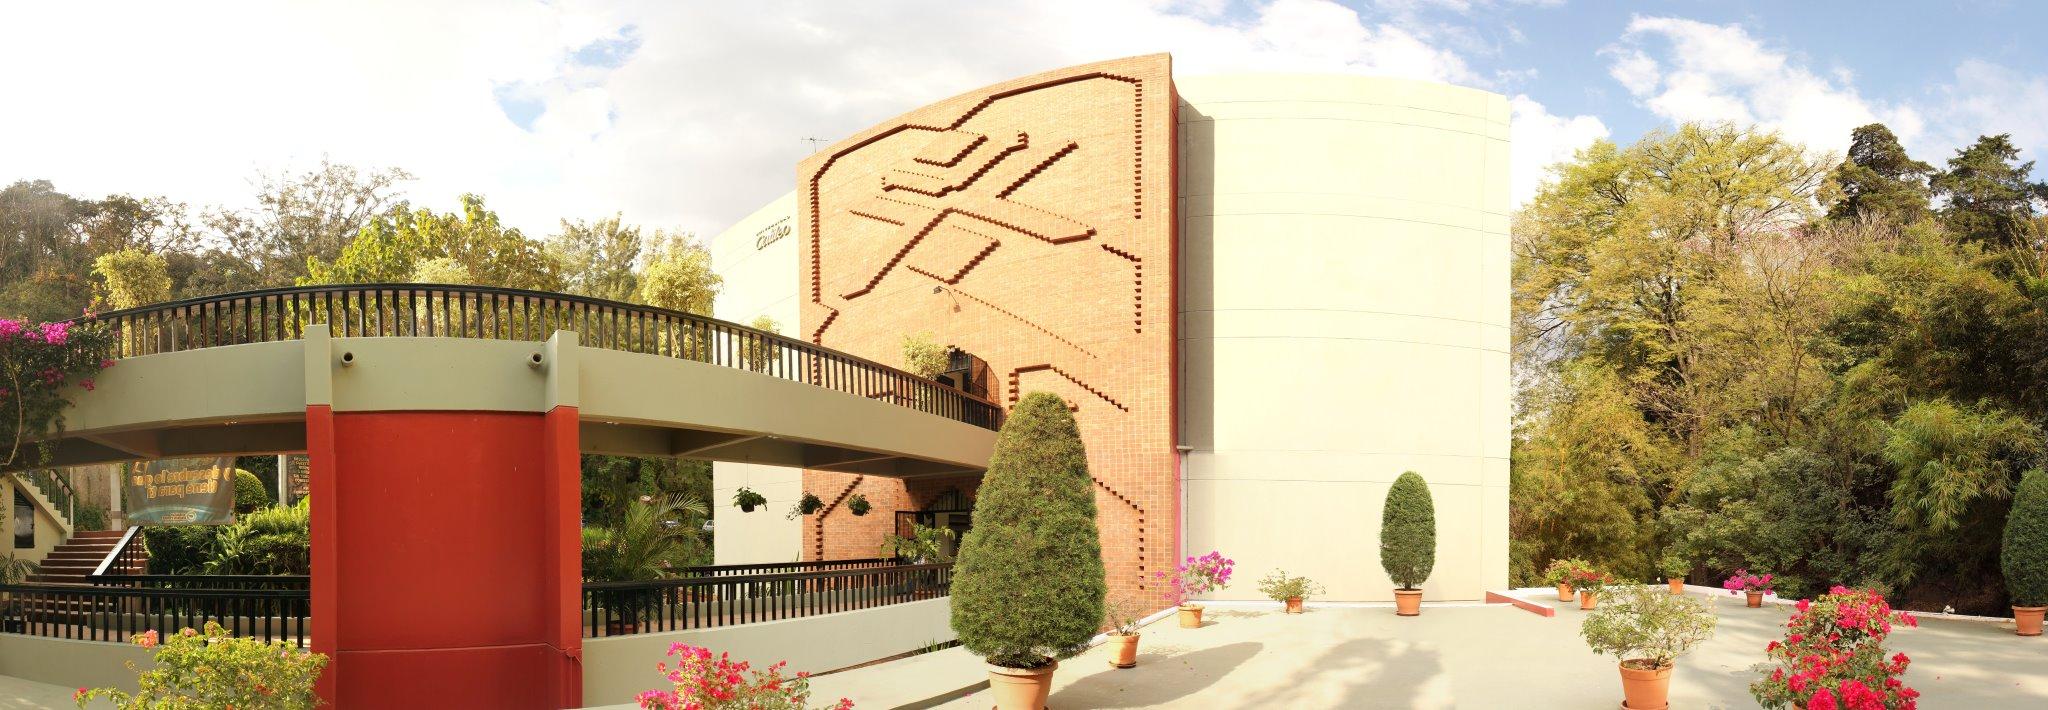 Universidad Galileo - Galileo Campus